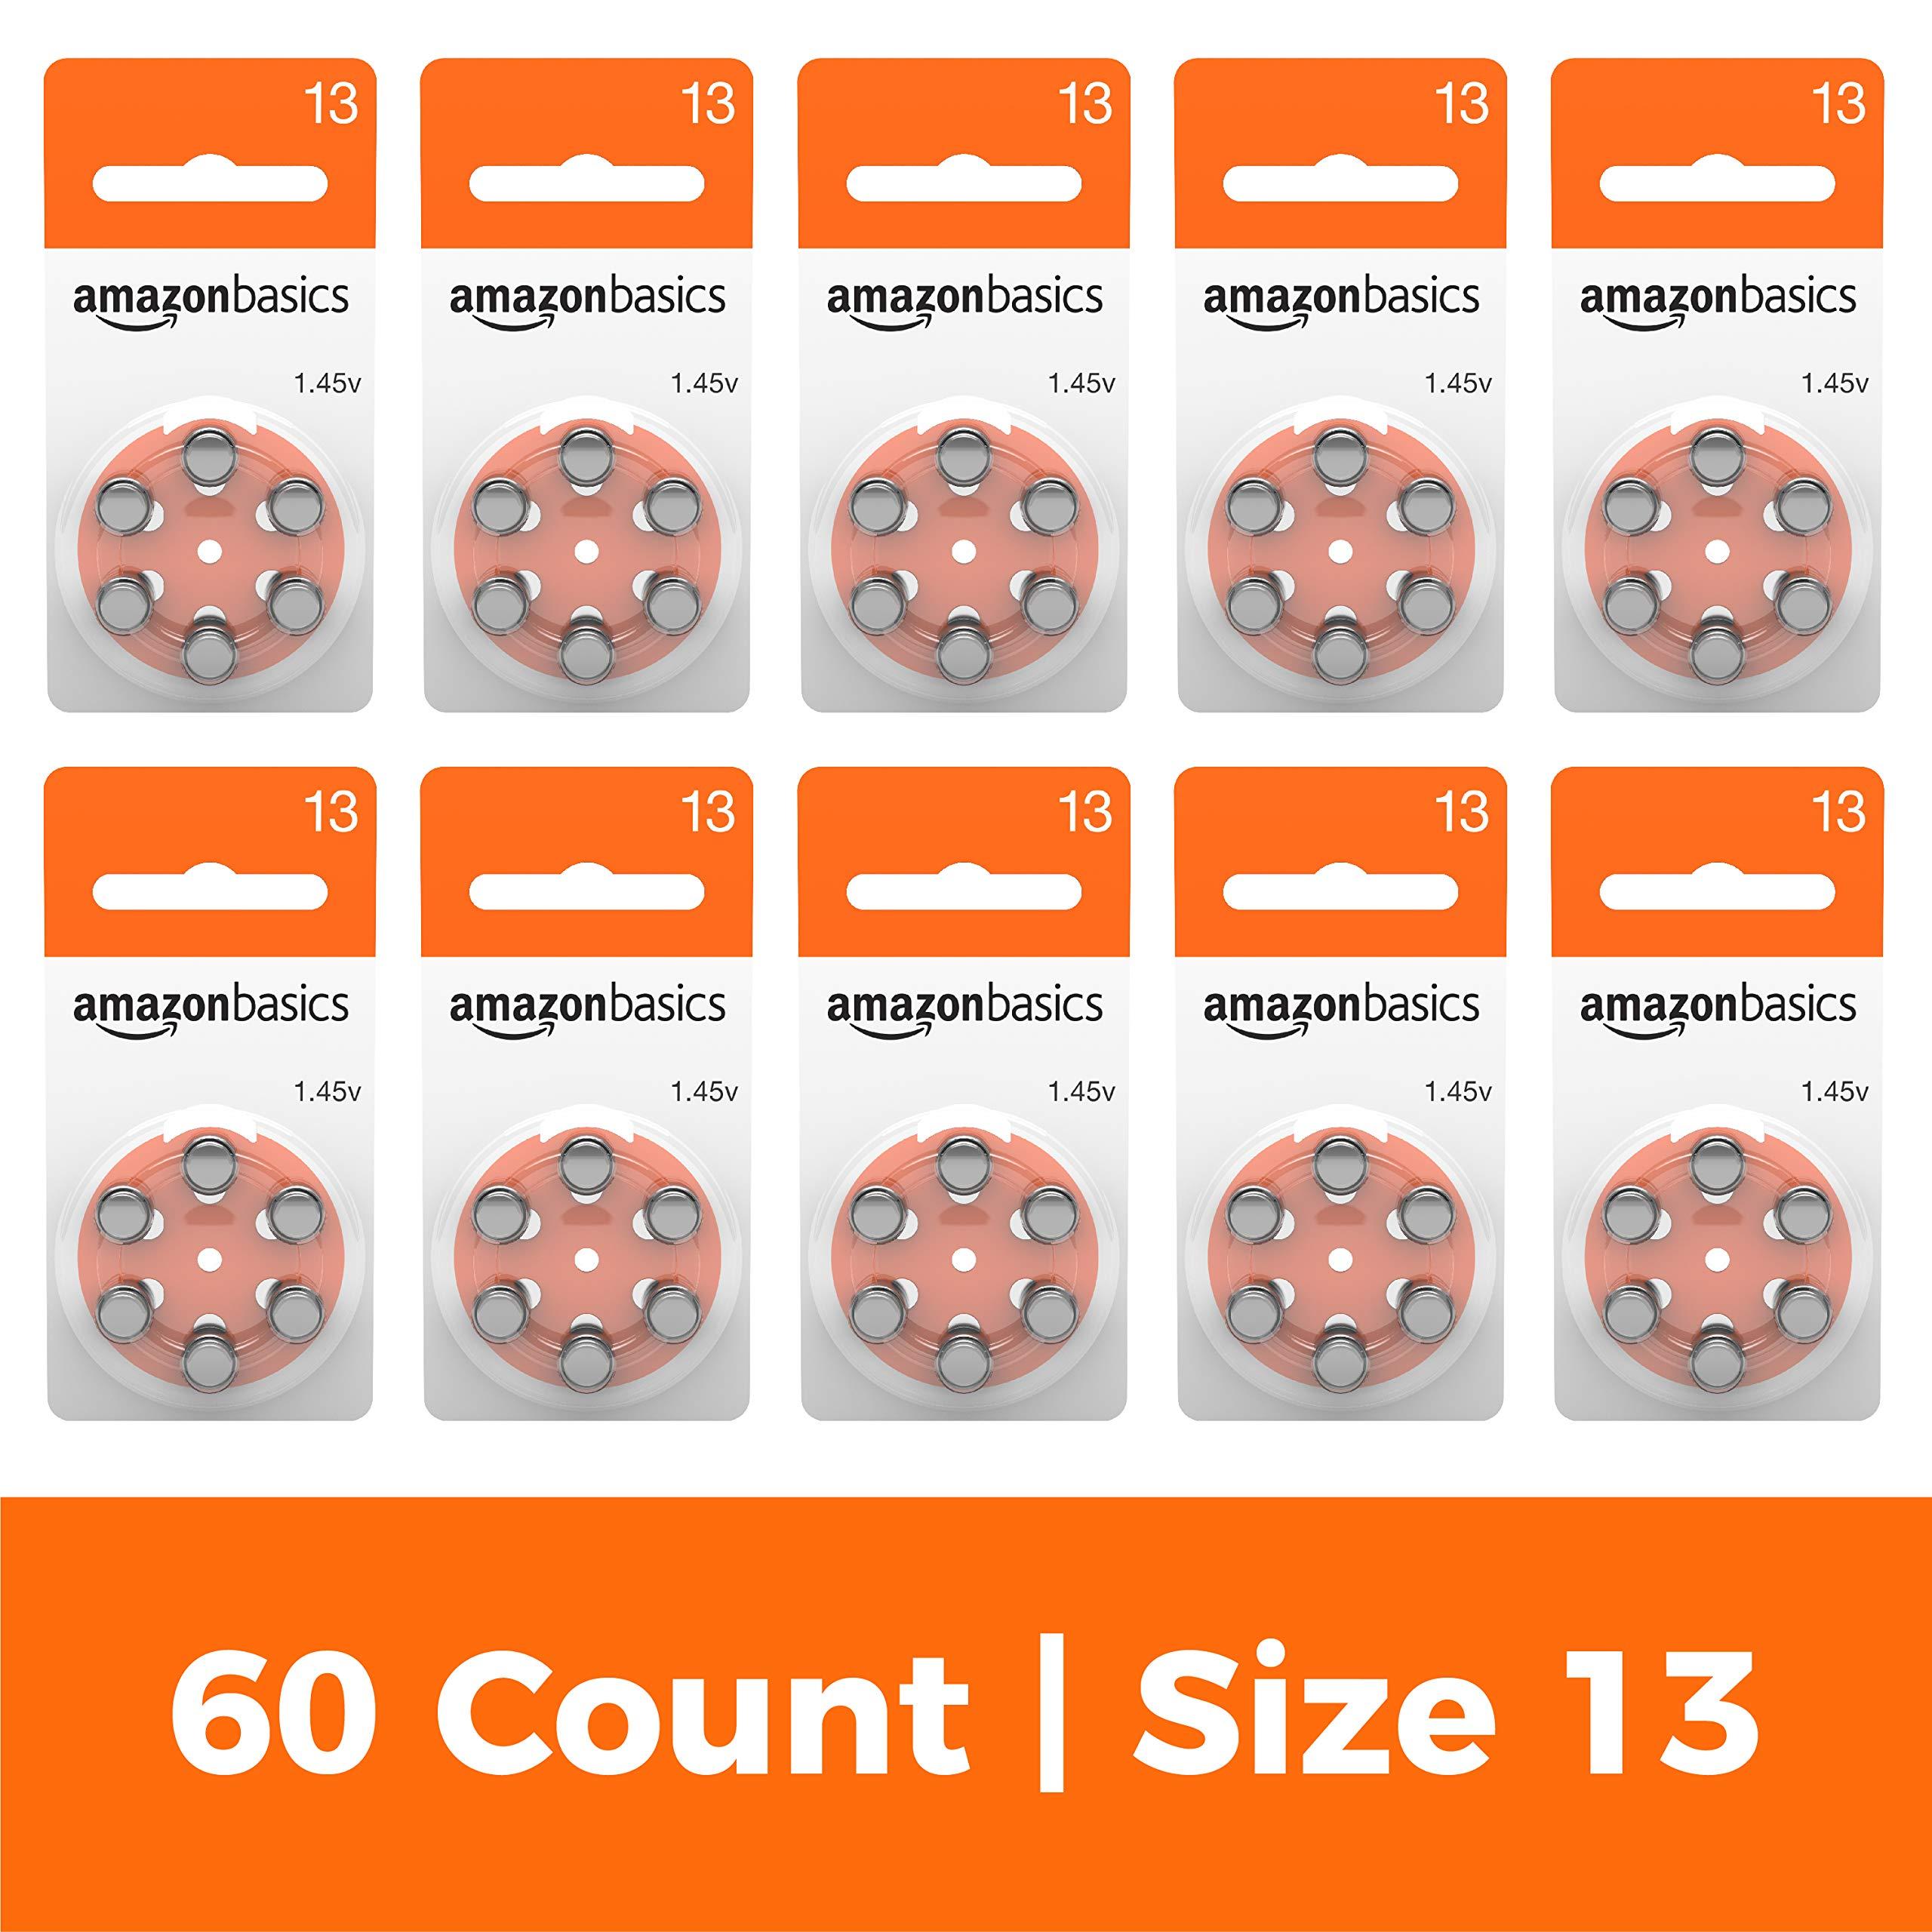 AmazonBasics Size 13 Hearing Aid Batteries, 60-Pack